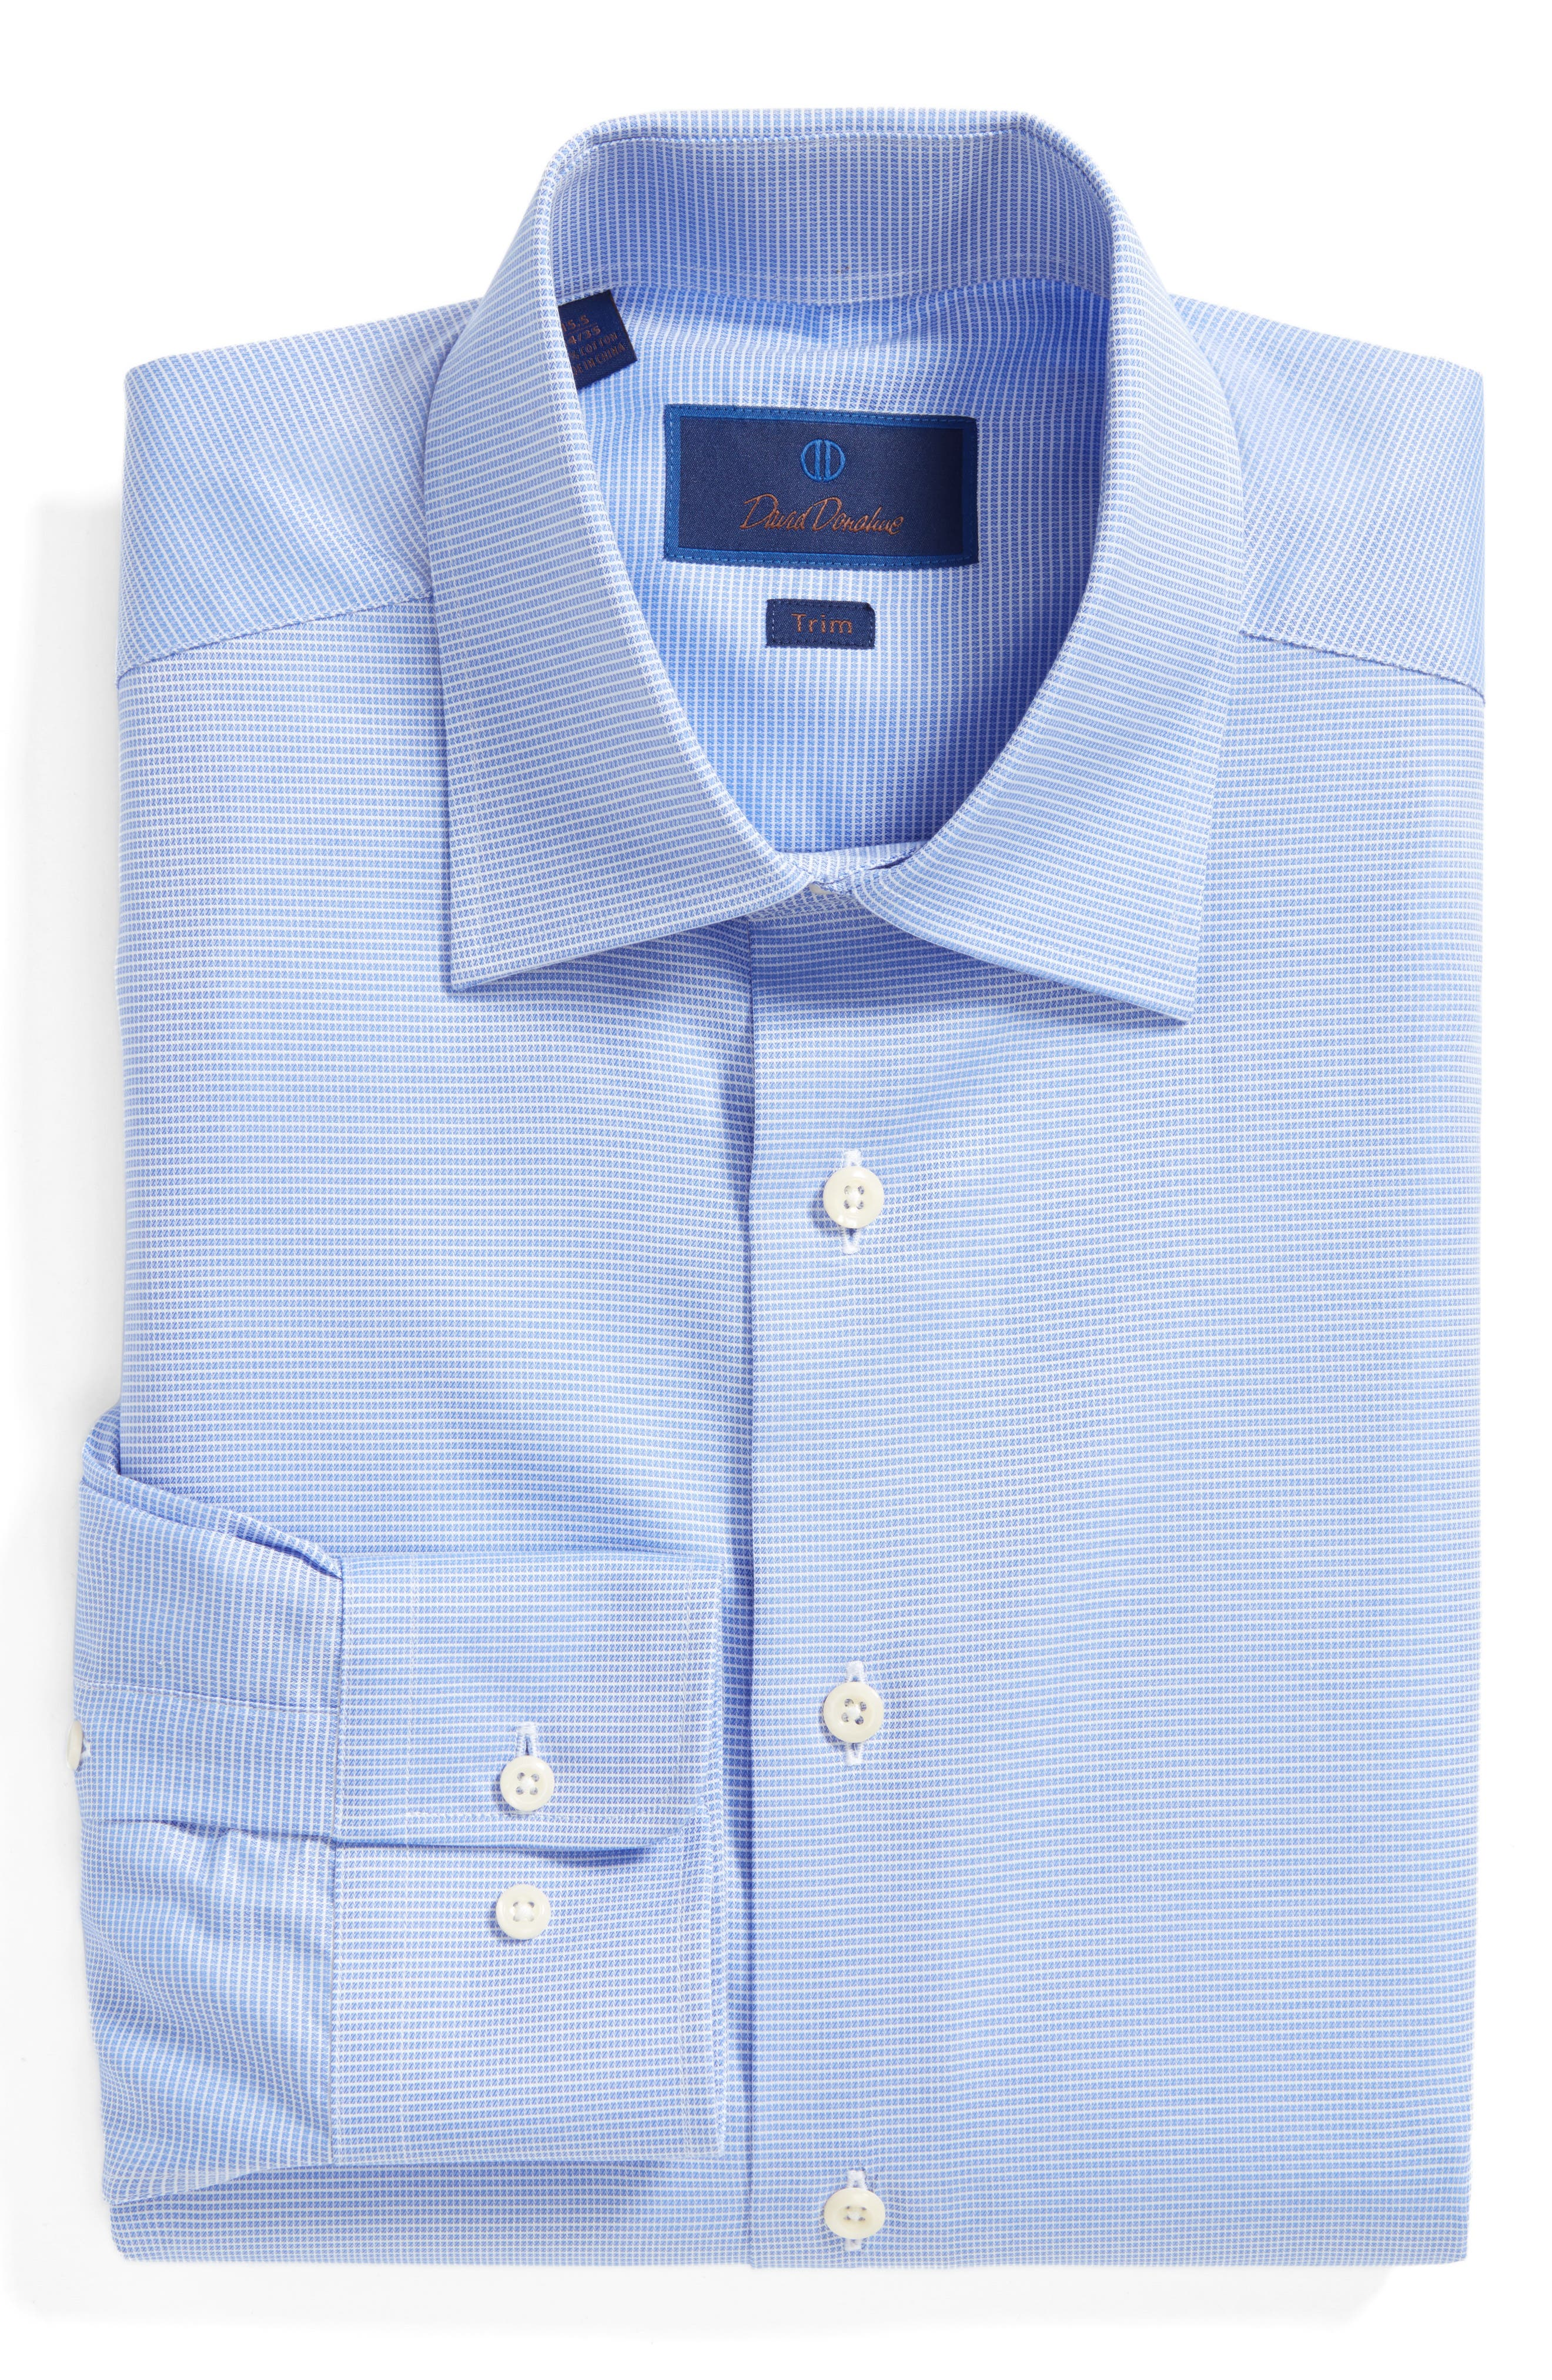 Main Image - David Donahue Trim Fit Microcheck Dress Shirt